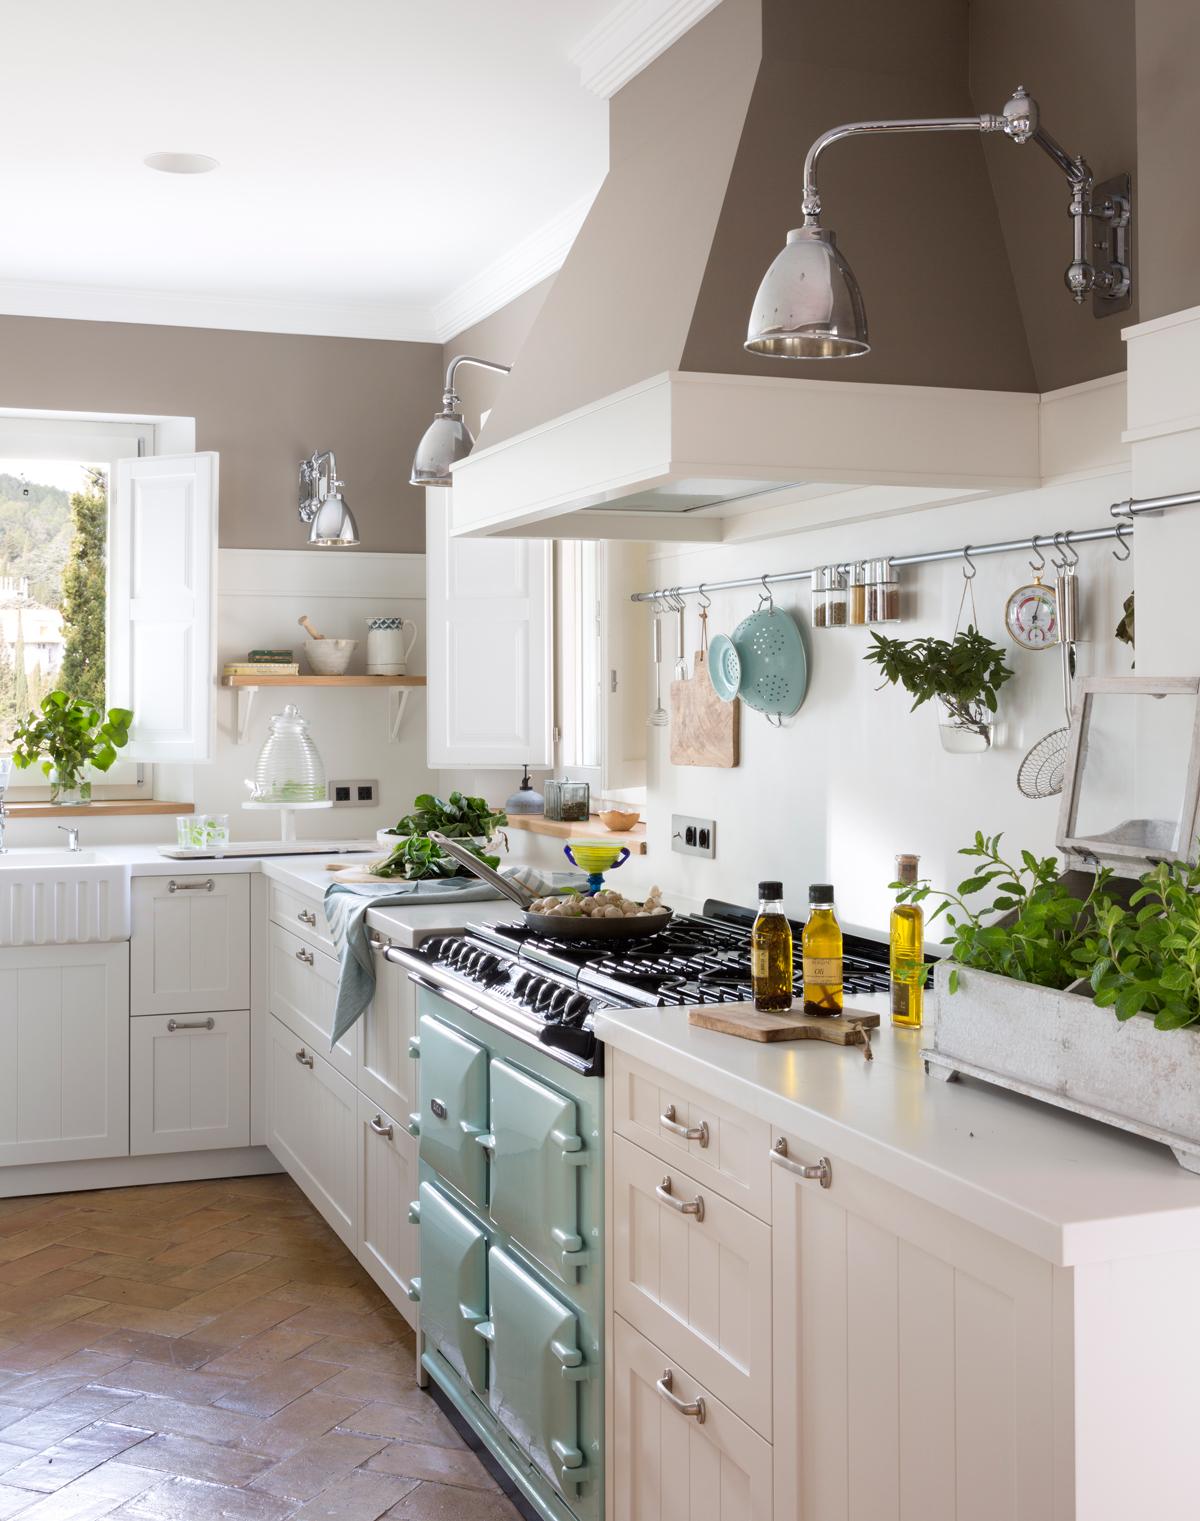 Dale color a tu cocina blanca - Pintura para baldosas cocina ...